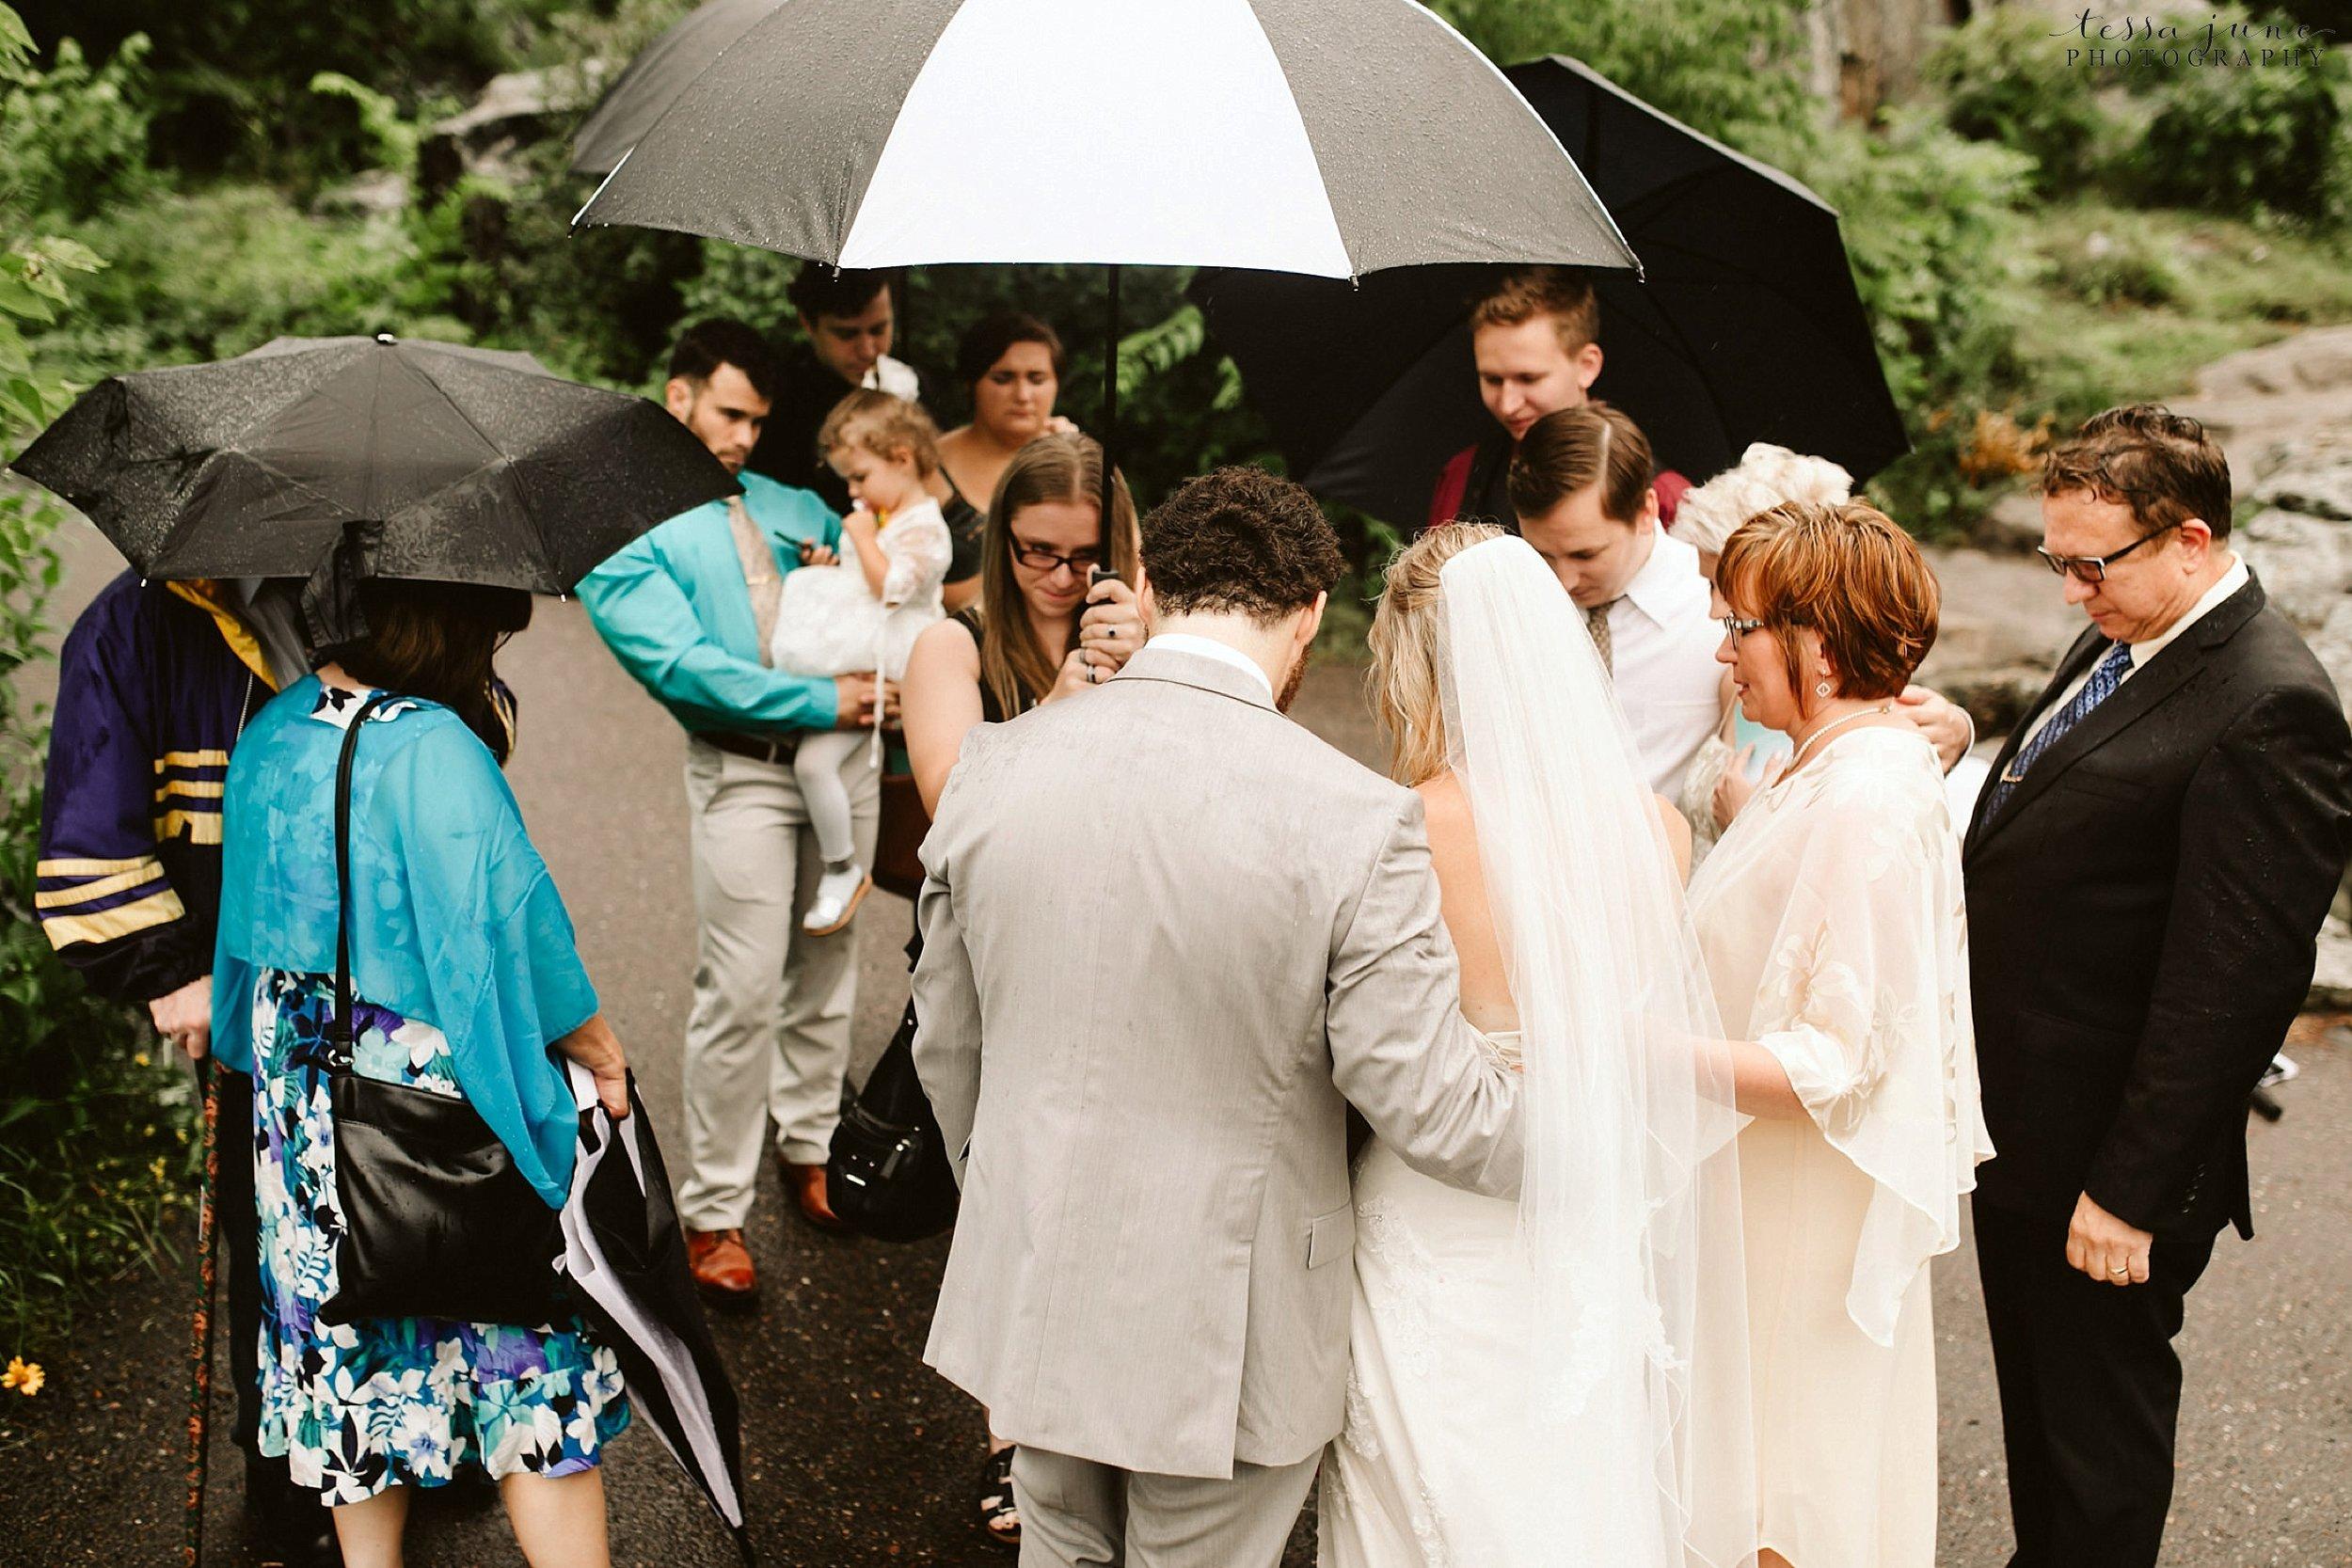 taylors-falls-rainy-elopement-wedding-interstate-state-park-69.jpg